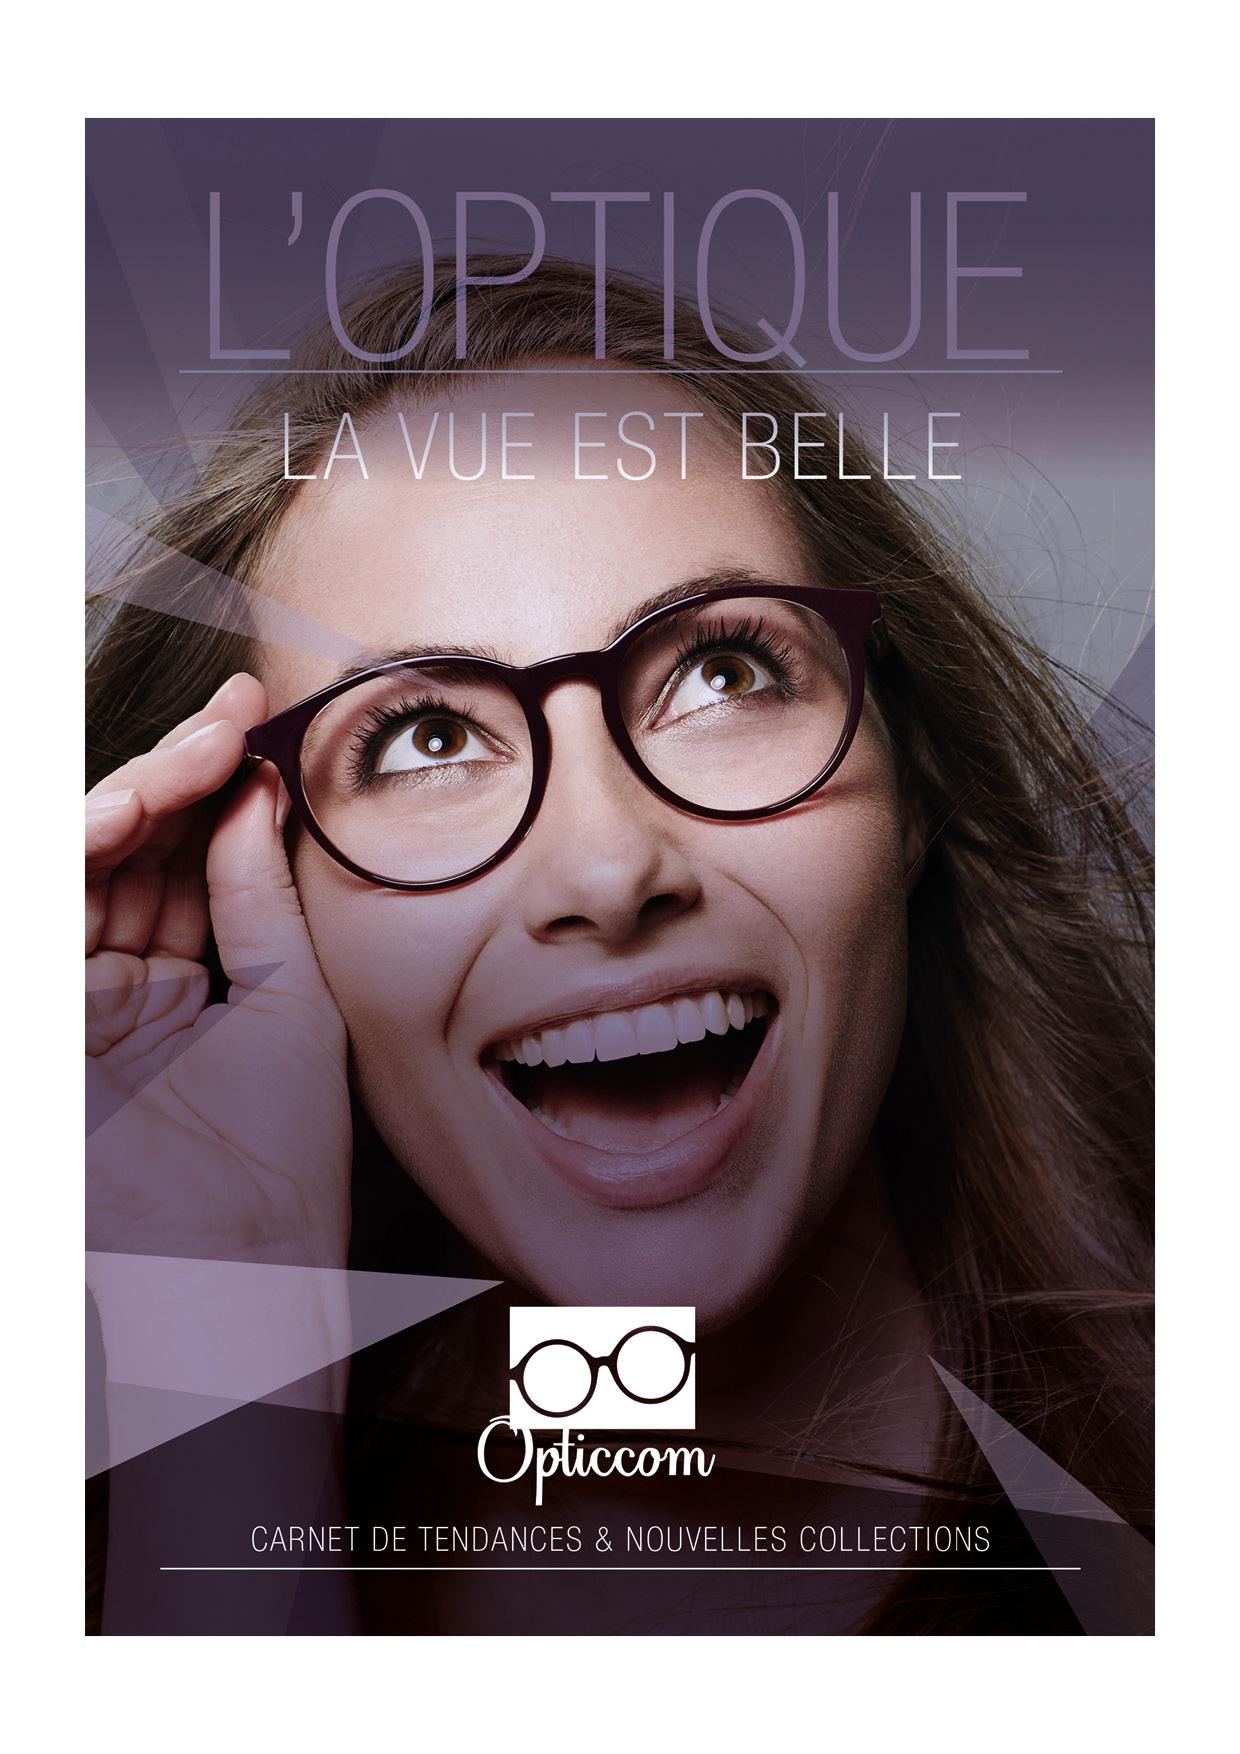 La brochure Opticcom